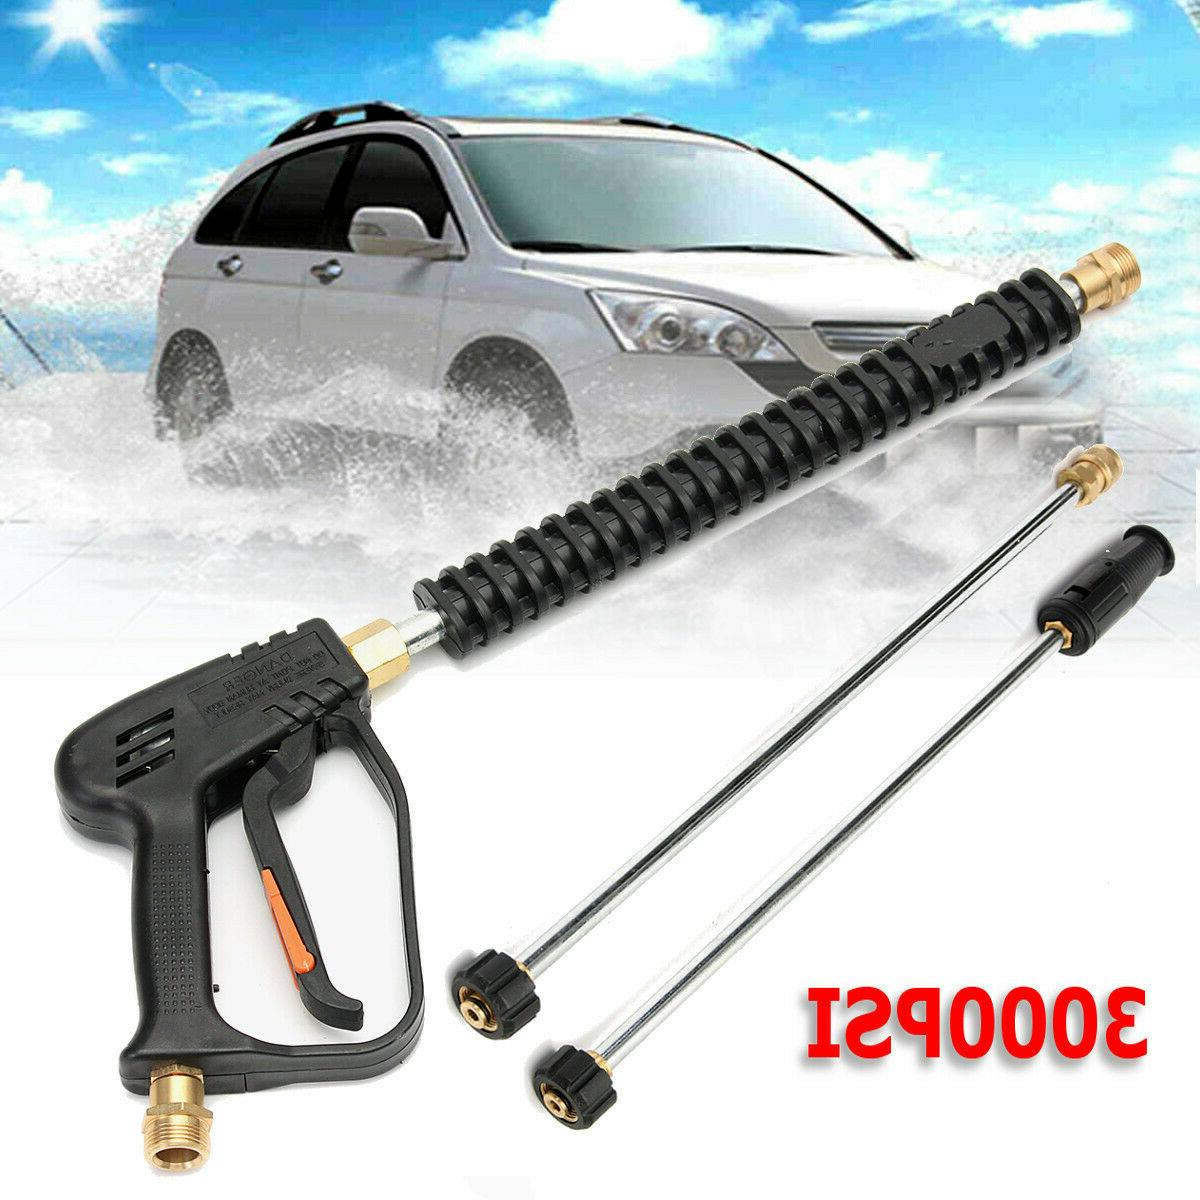 3000 PSI High Car Spray Gun Wand Tips Hose